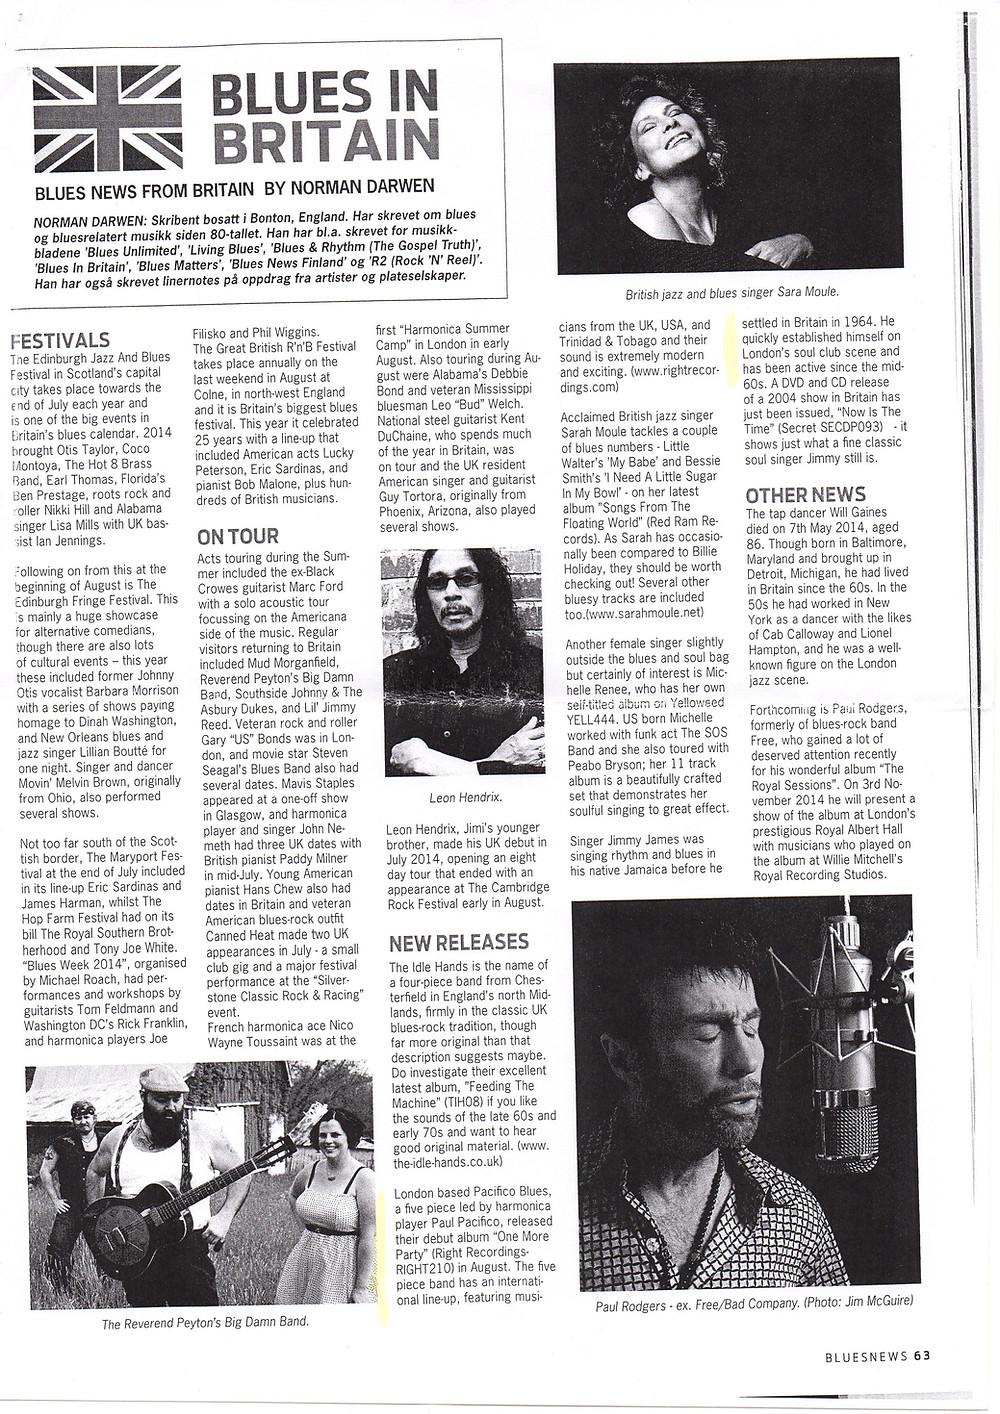 Bluesnews - Page 2.jpg